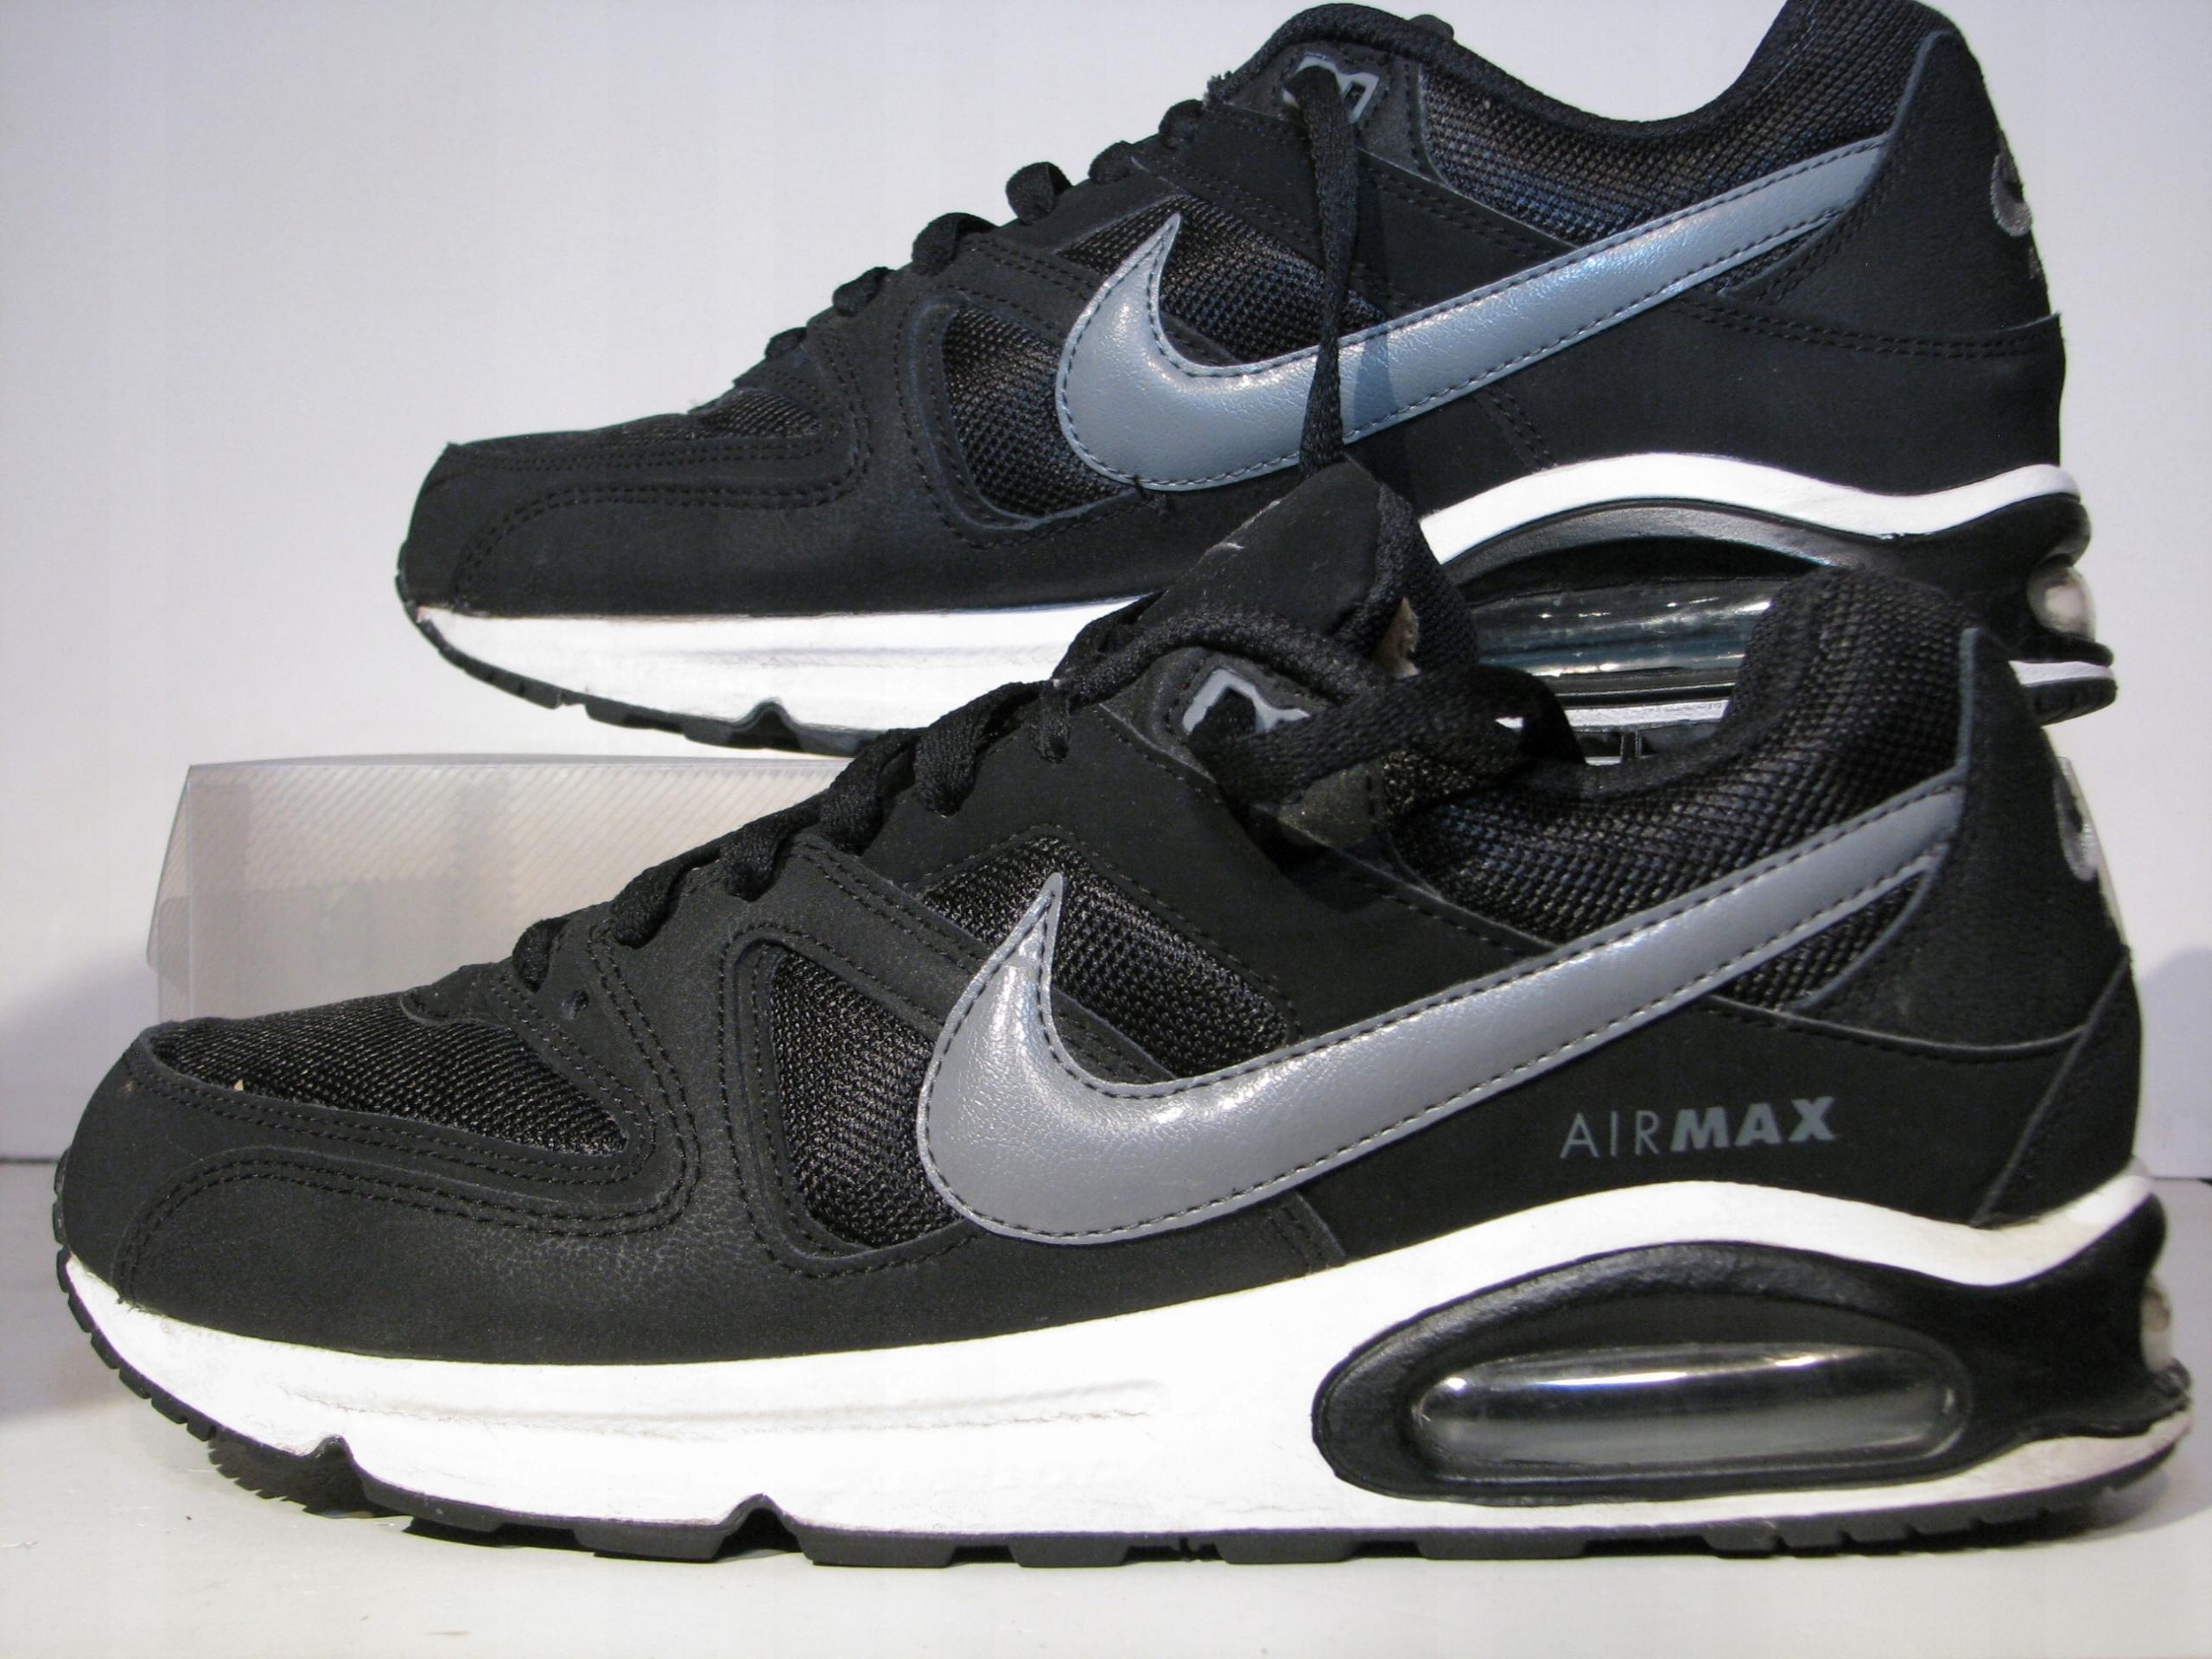 Buty Nike Air Max Command 047 EU 46 CM 30